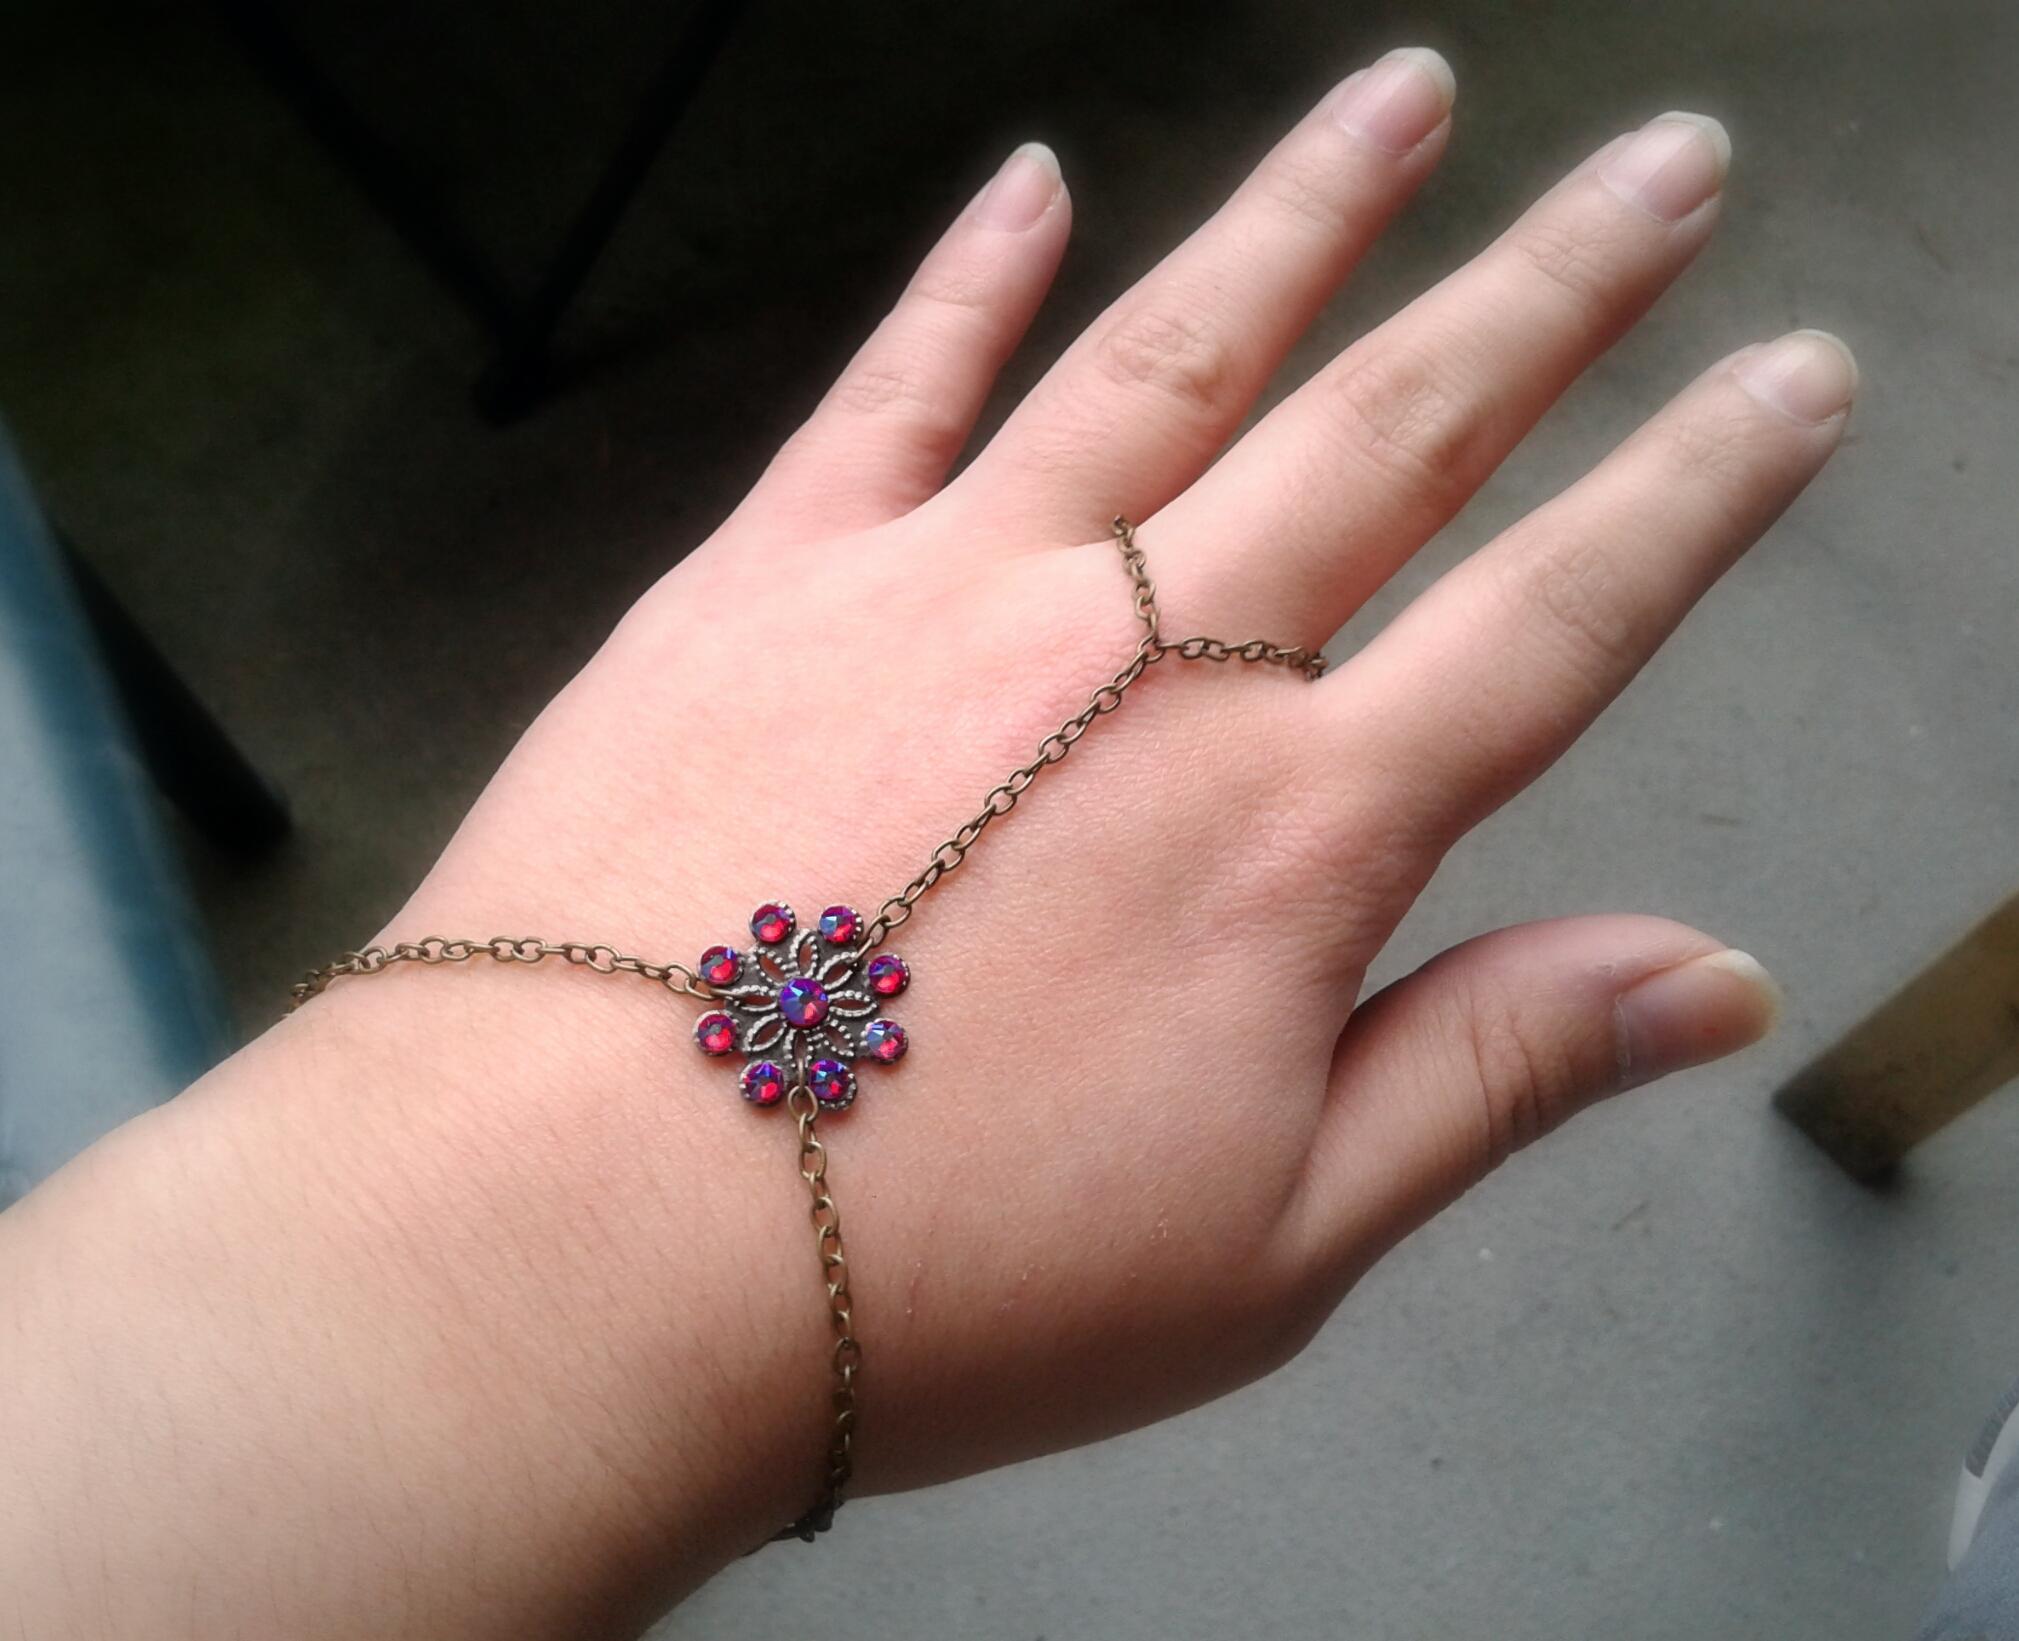 Slave Boho hand jewelry photo